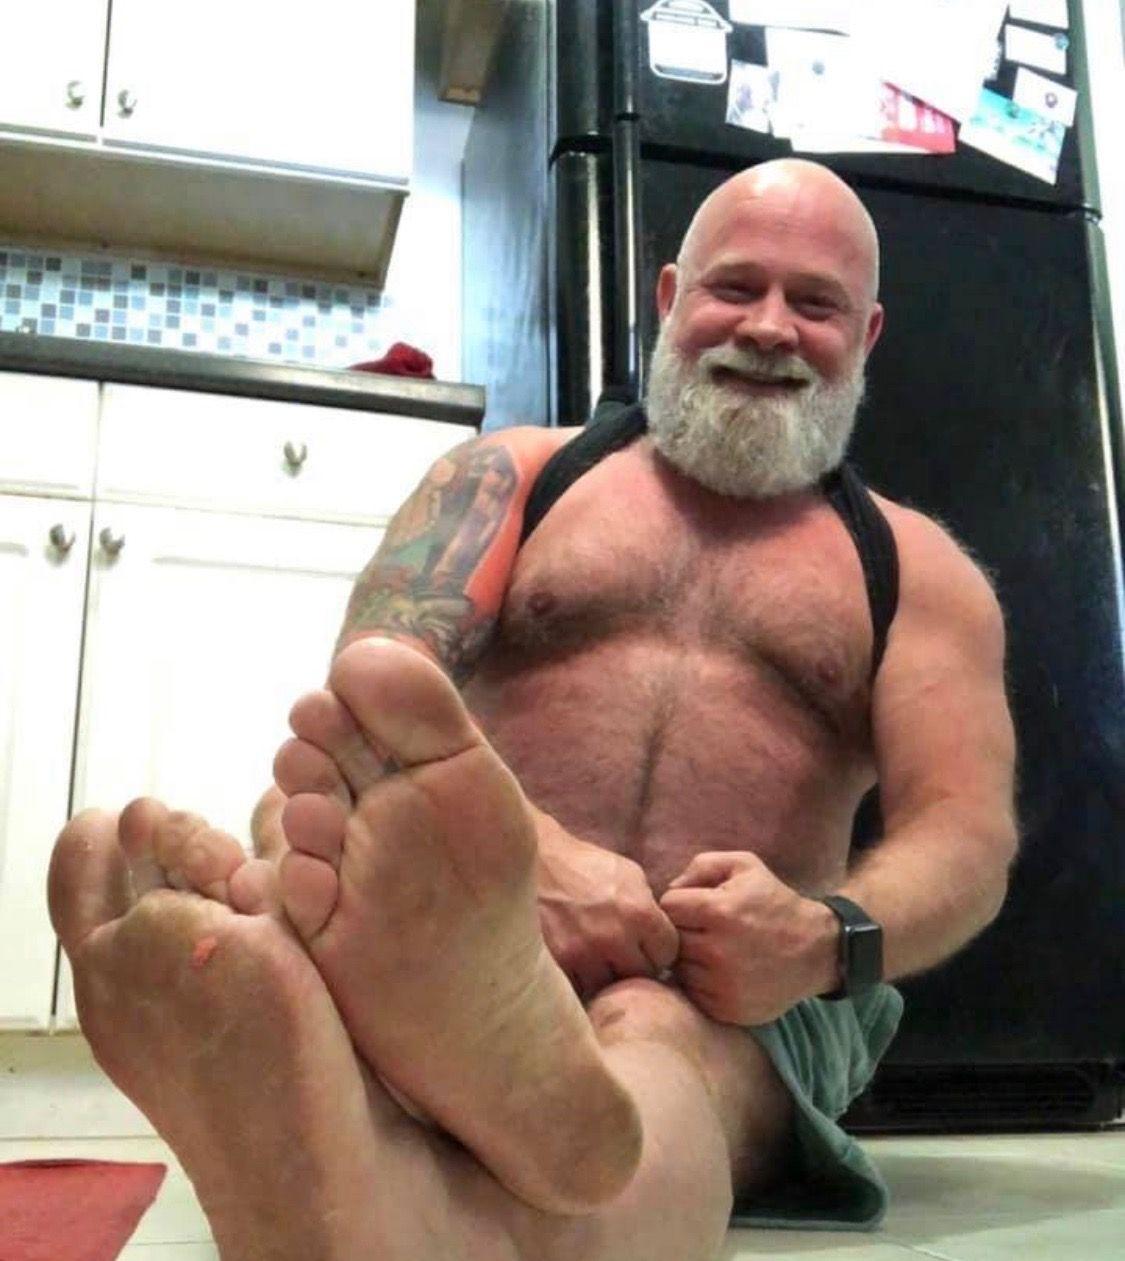 Pin By Sfwoof On Mature Man Feet Male Feet Older Men Sexy Feet